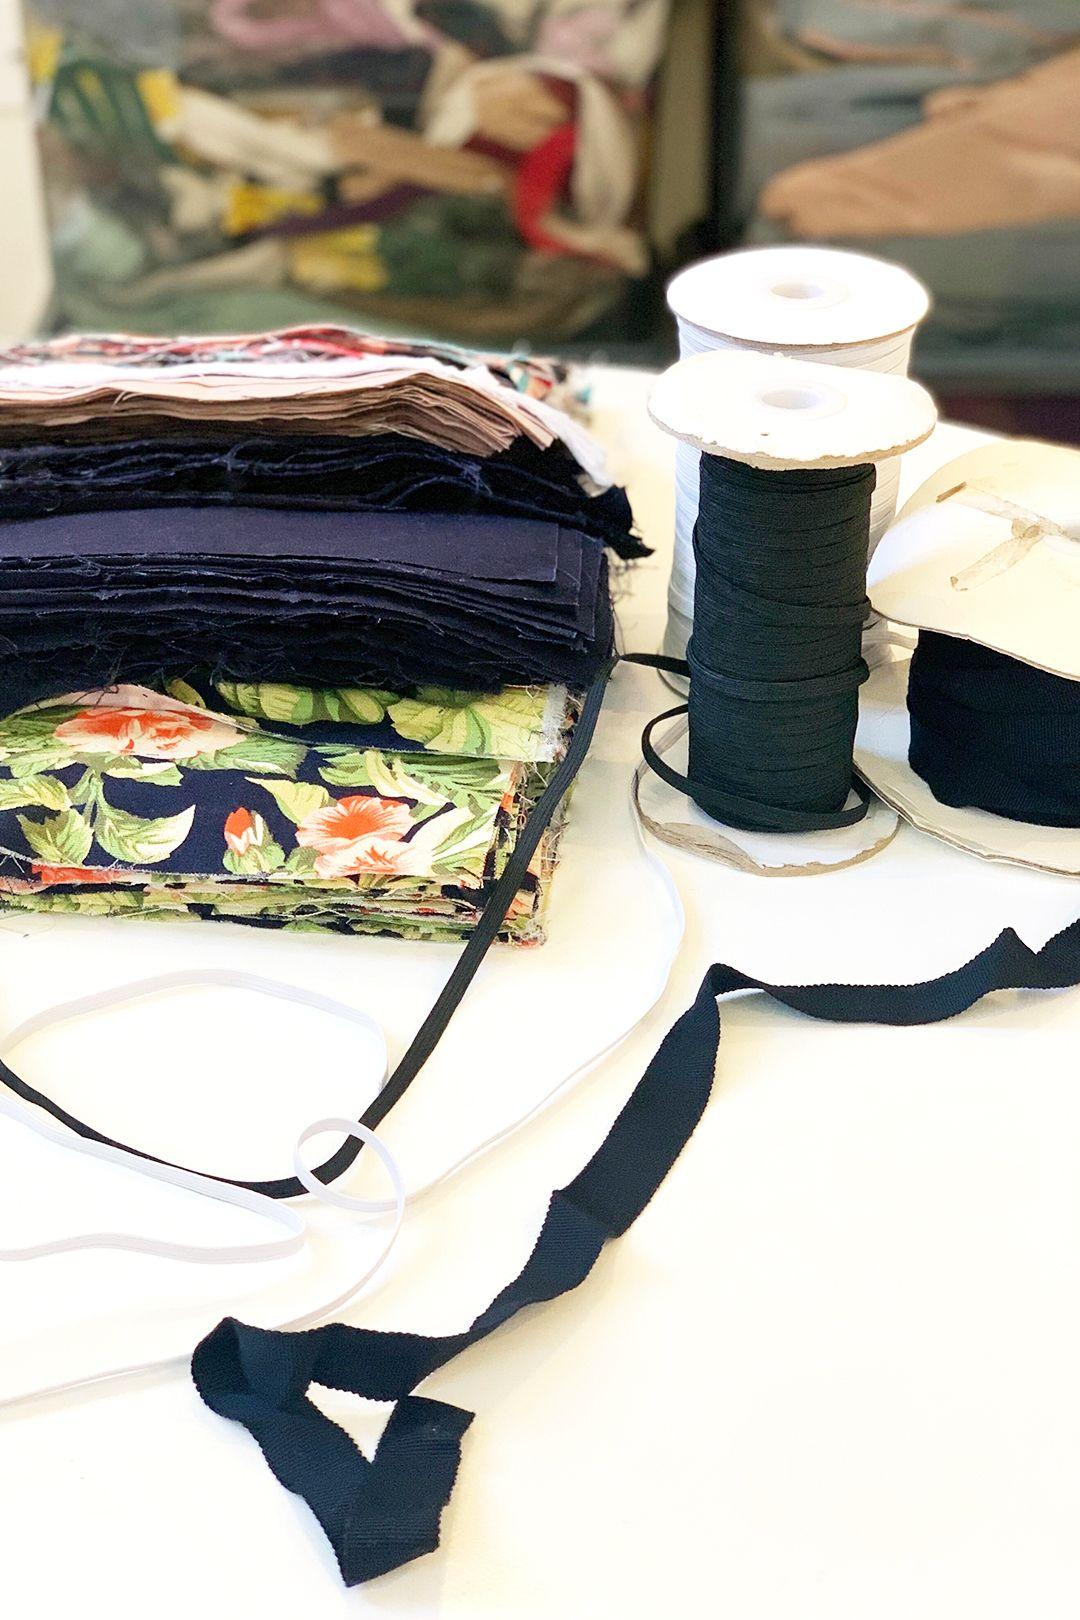 Black-Tie Dress Code - A GlamCorner Guide | Blog | GlamCorner